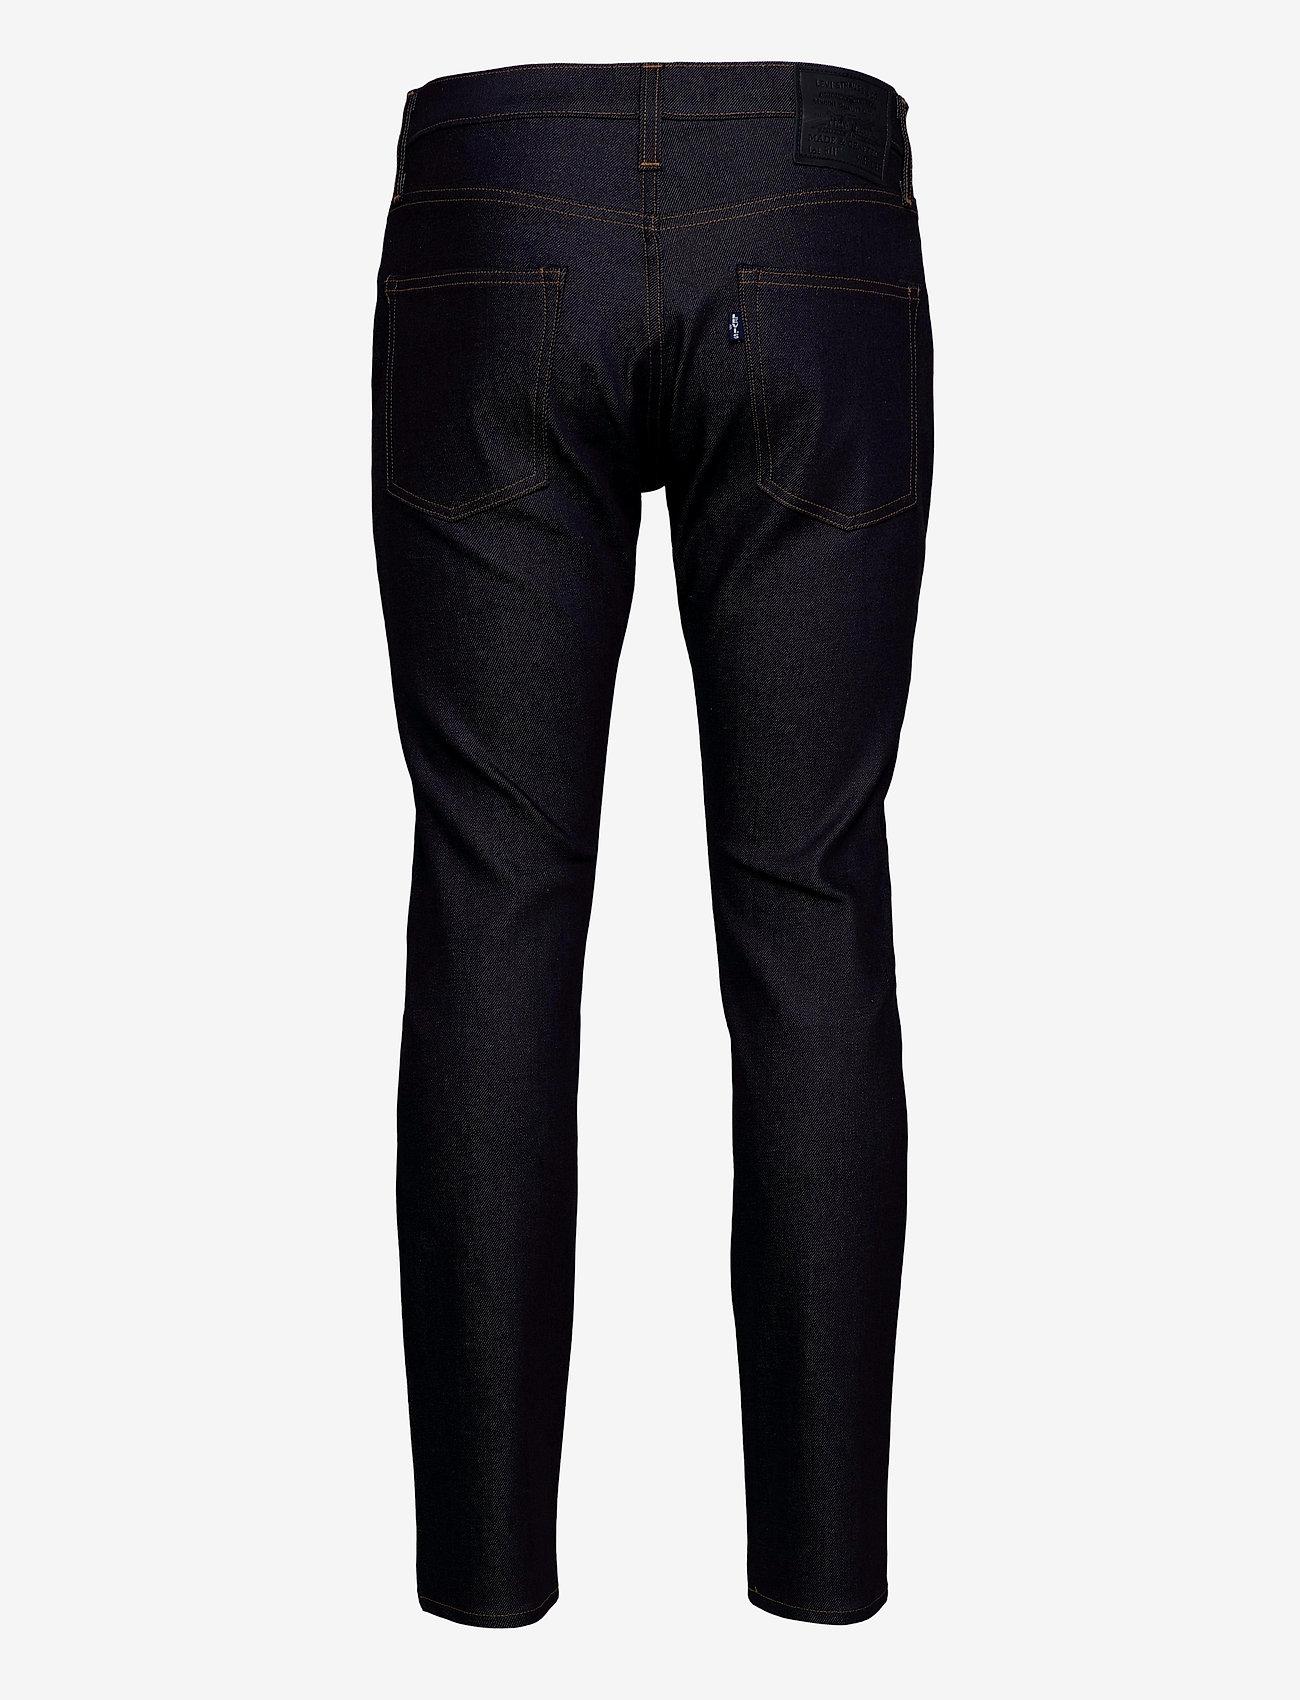 Levi's Made & Crafted - LMC 511 LMC CRISP MOJ - slim jeans - dark indigo - flat finish - 1